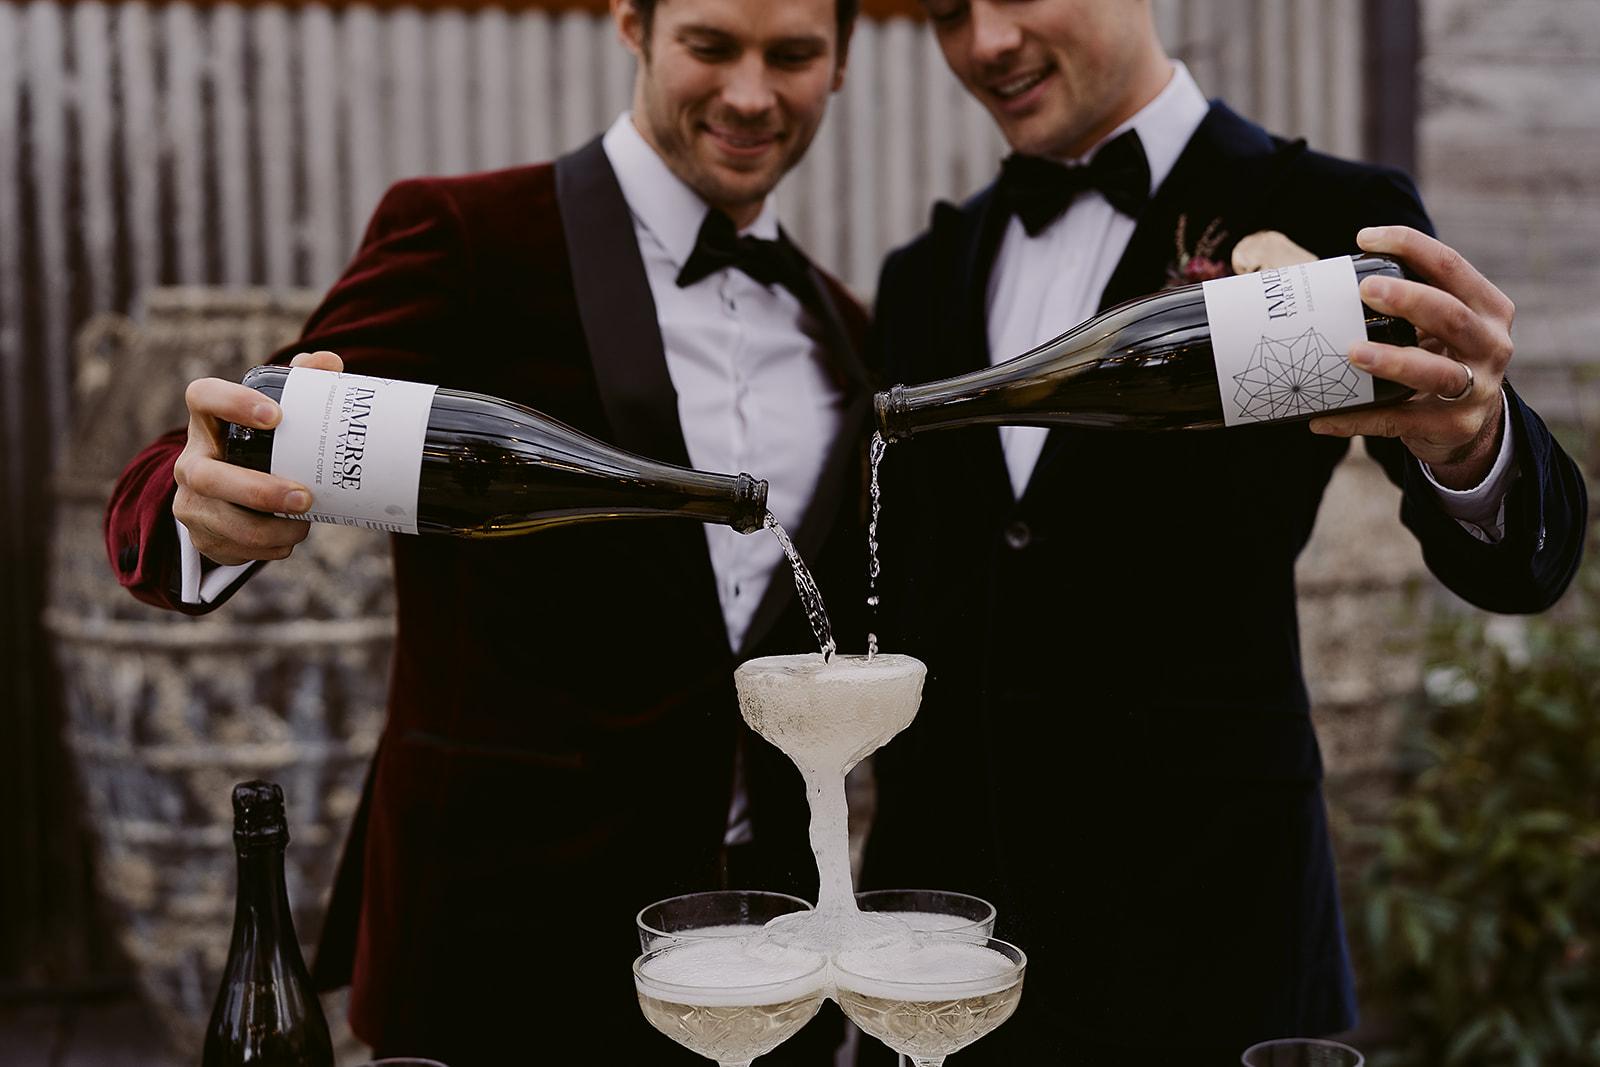 Immerse_Yarra_Valley_Same_Sex_Wedding_-_Ashleigh_Haase_Photography-127.jpg